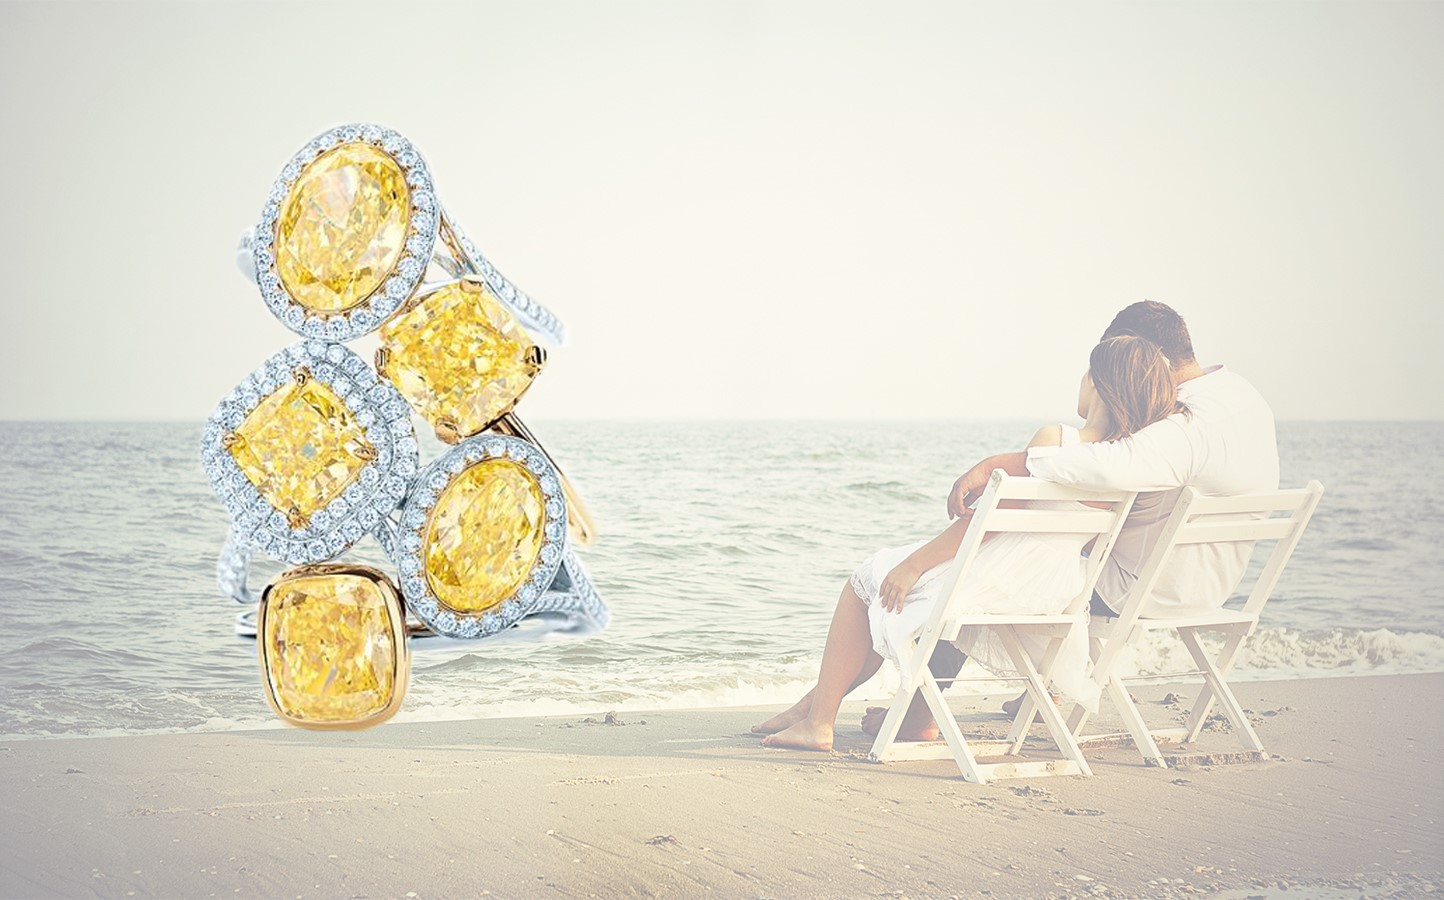 Romantic_Wallpaper yellow dia rings.jpg